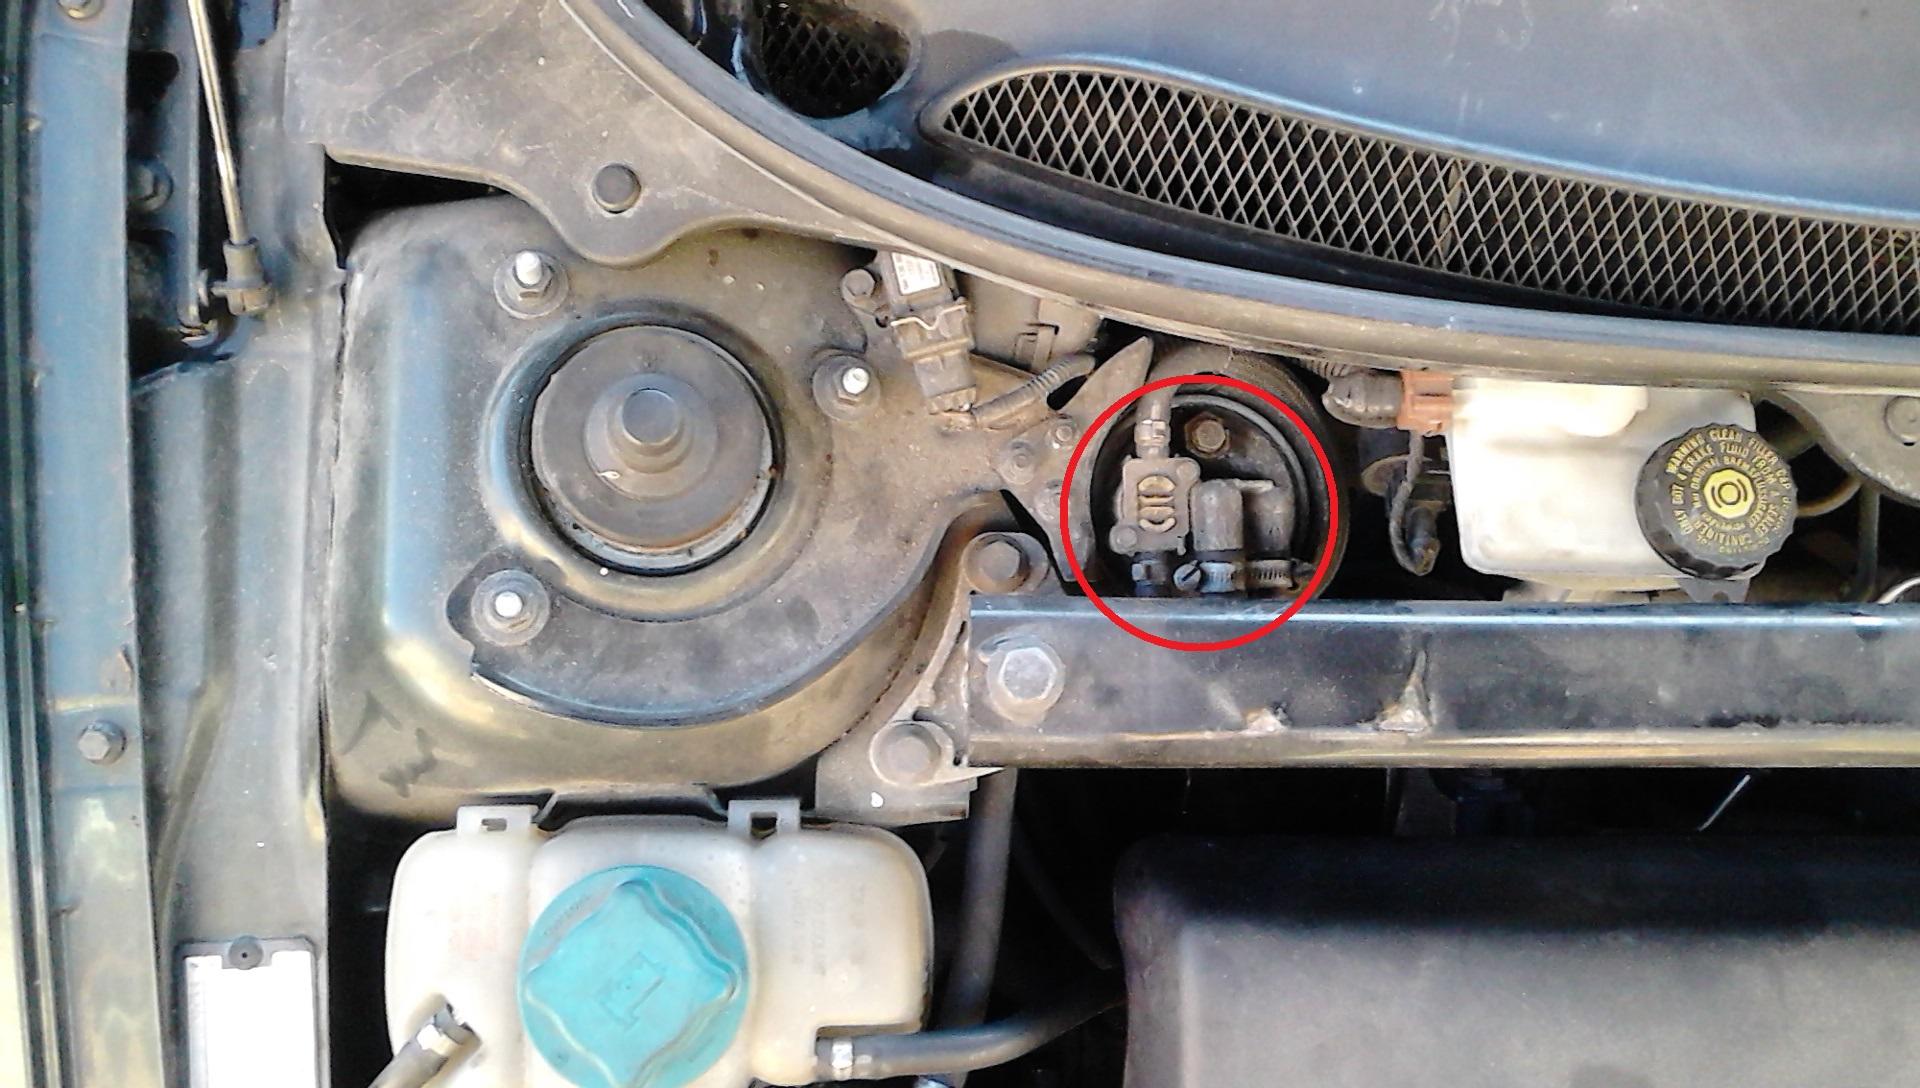 2001 V70 2.5 TDi Fuel Filter Replacement - Engine Bay | Volvo S70 Fuel Filter Location |  | Matthews Volvo Site